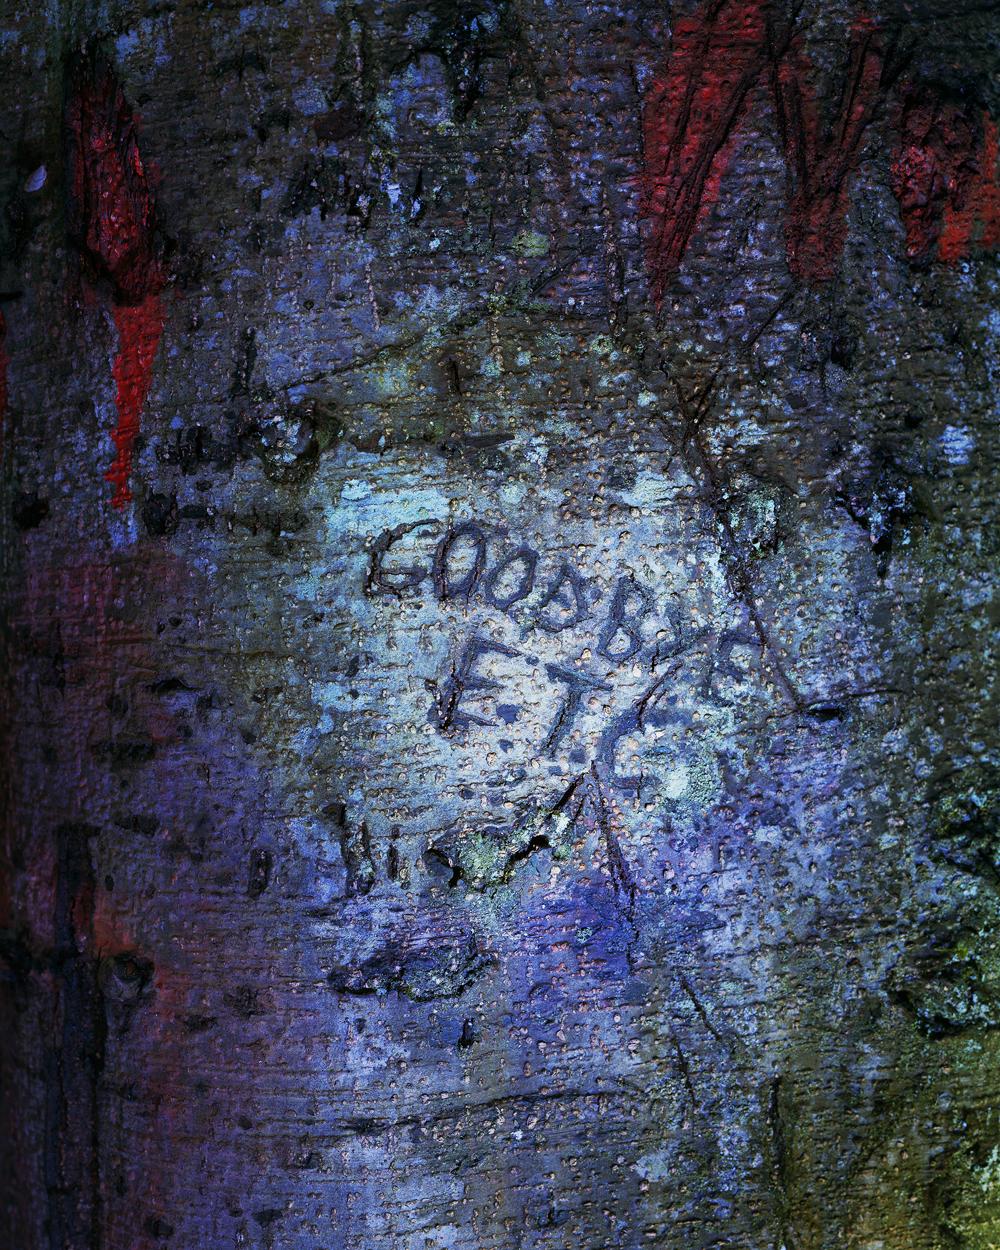 Eirik Johnson, GOODBYE E.T.C., 2016, archival pigment print, 20 x 16 inches, edition of 5, $2950.